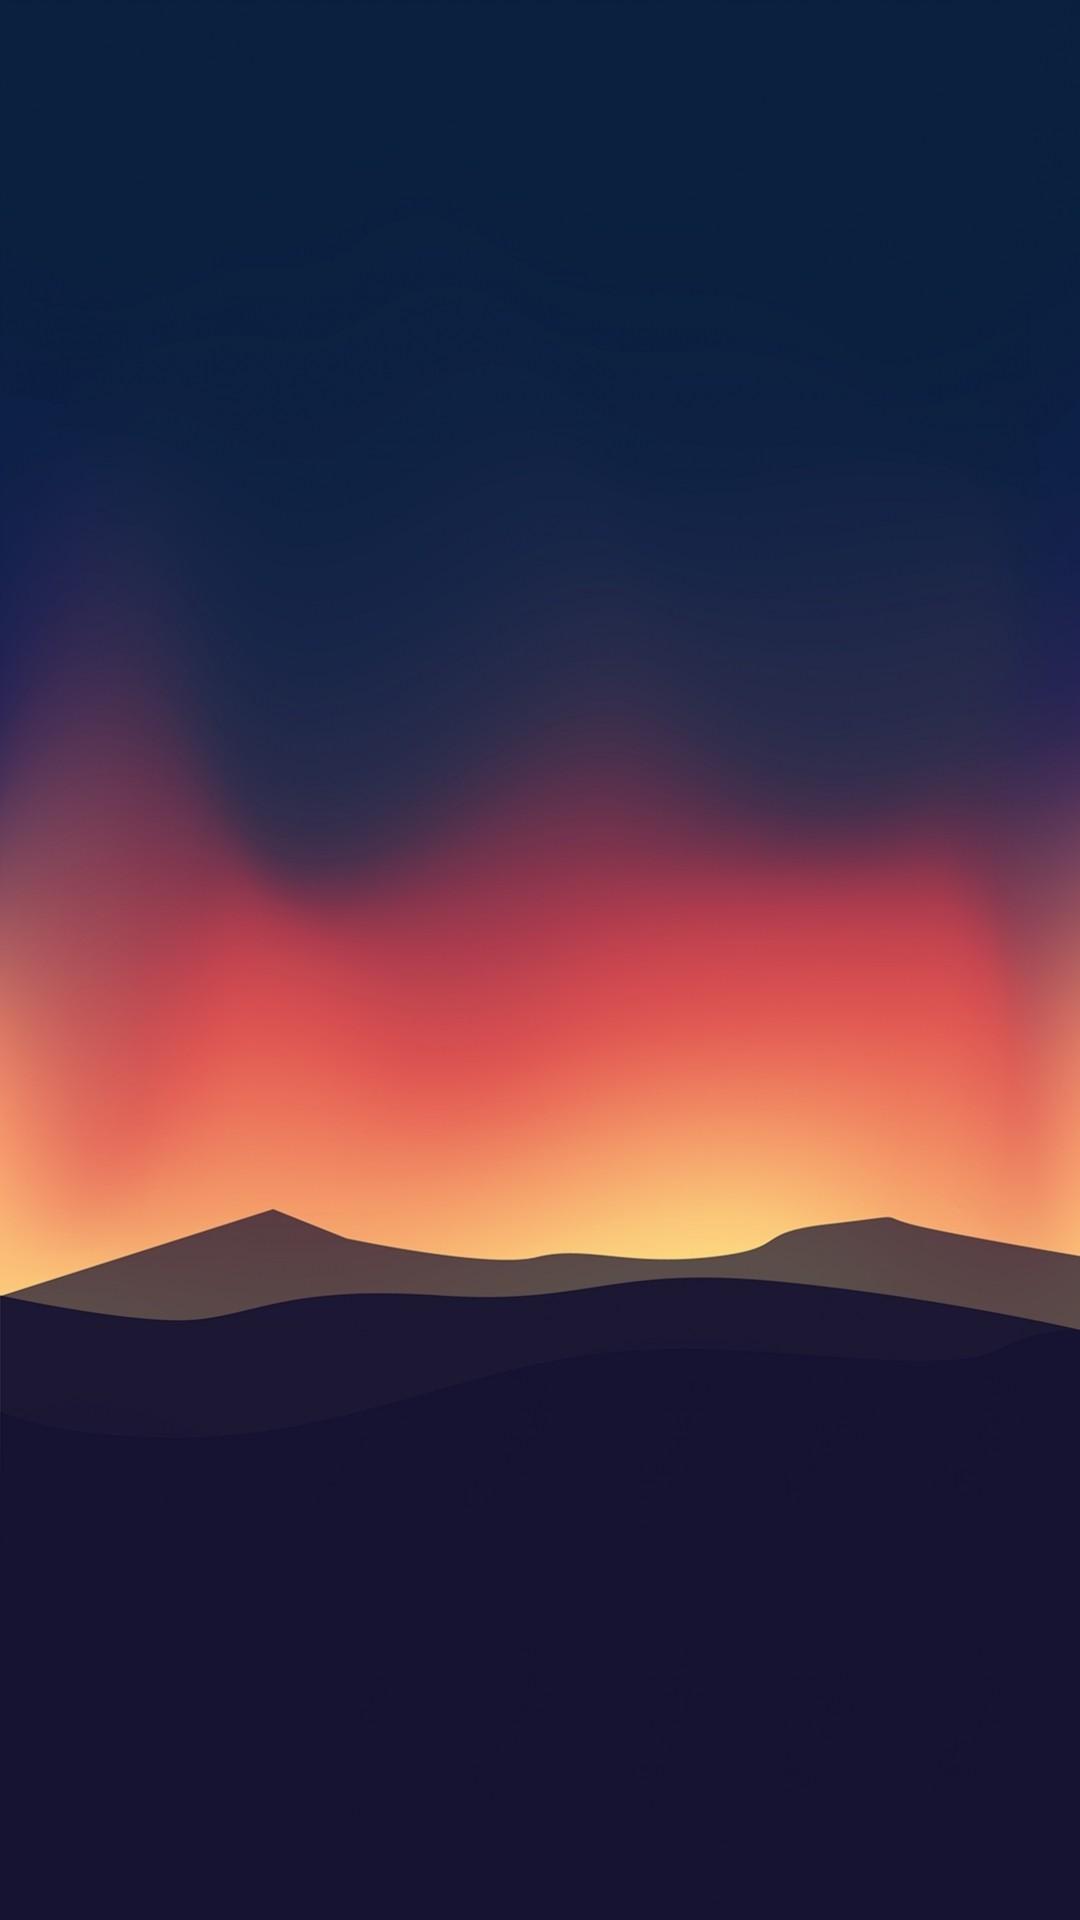 Abstract 7 Wallpaper 1080x1920 380x676